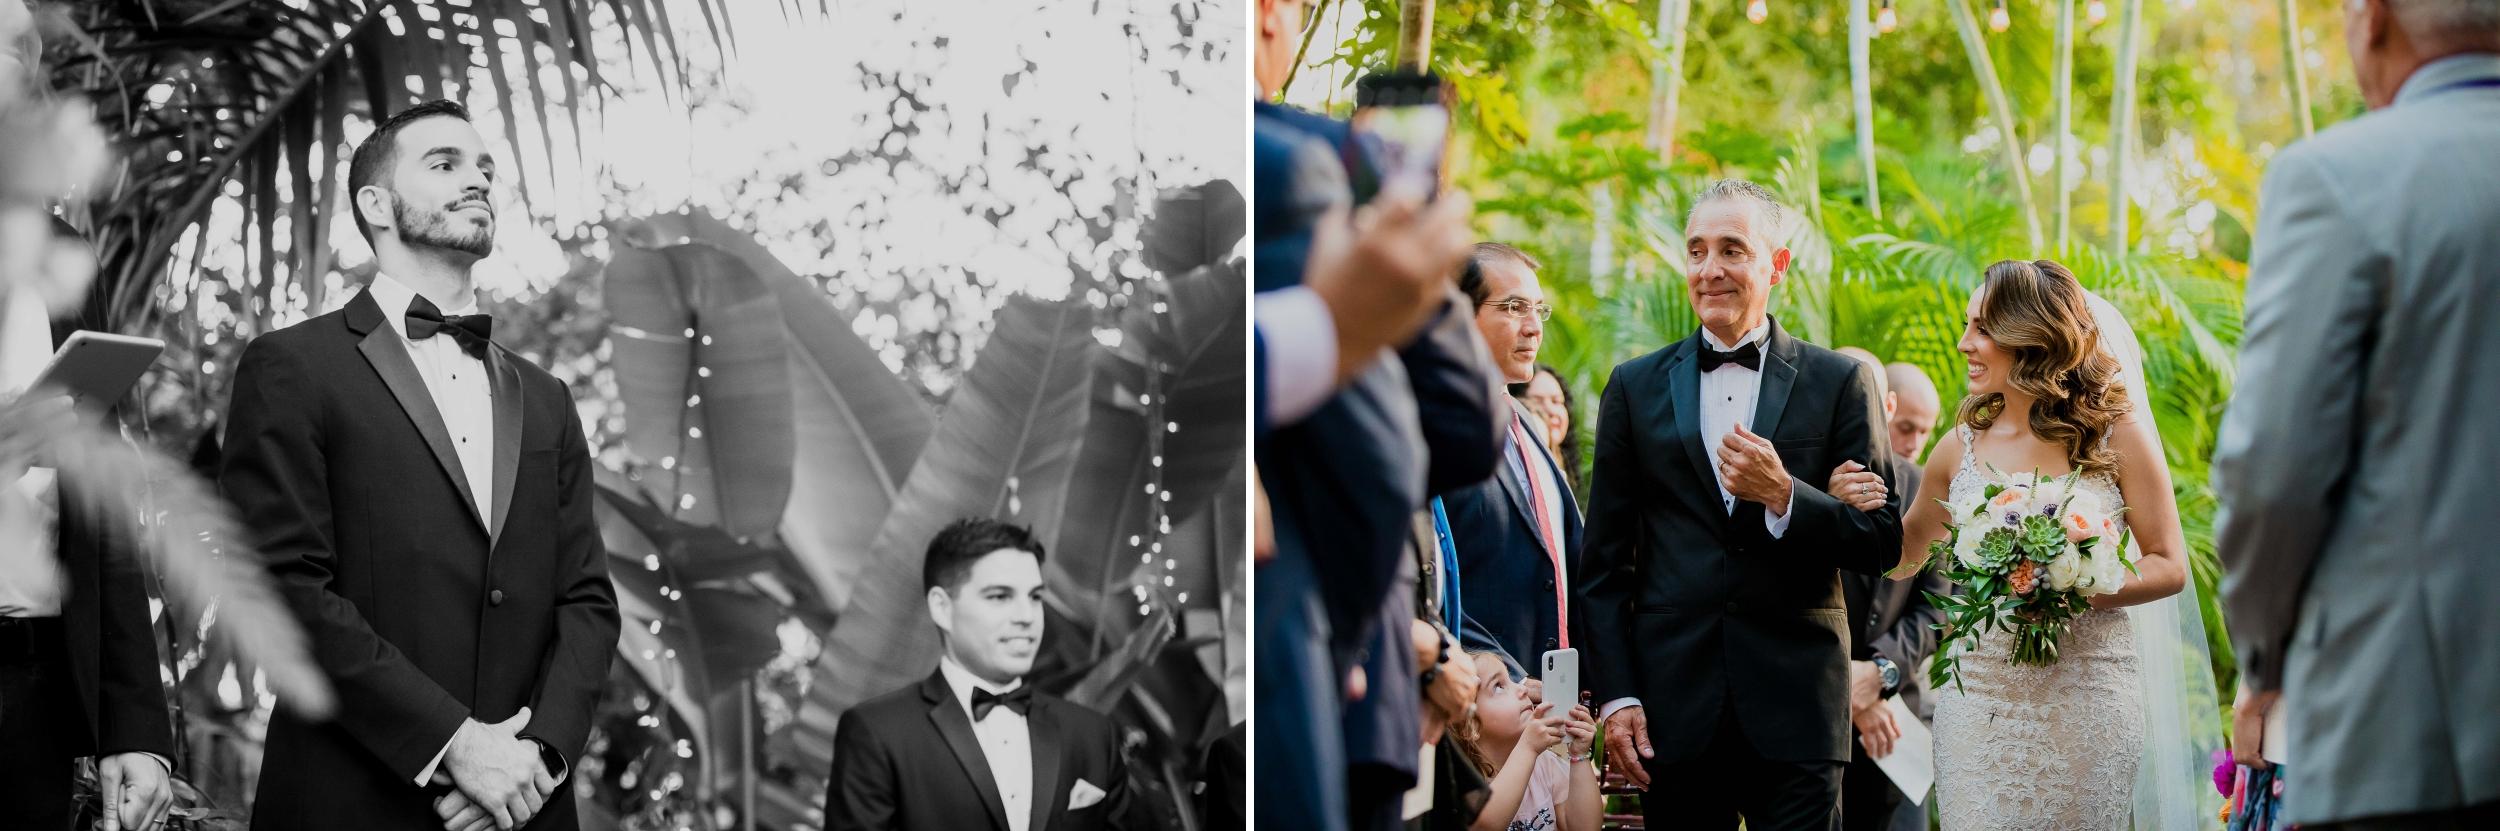 Wedding Miller Plantation Photography by Santy Martinez 10.jpg